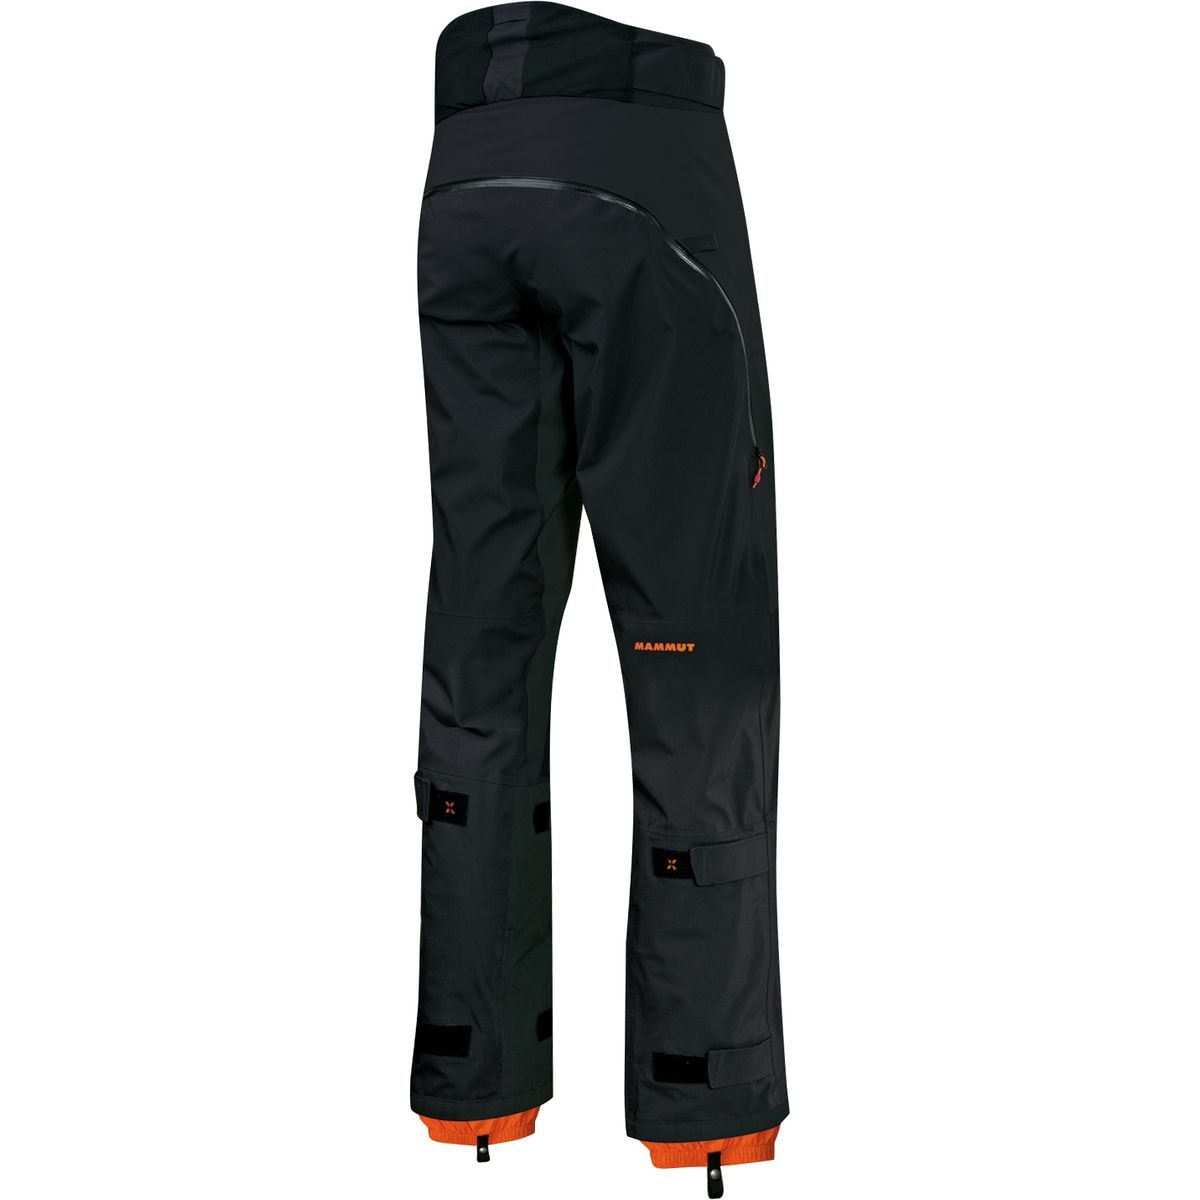 Mammut Mittellegi Pro Women s HS Pants  Amazon.co.uk  Sports   Outdoors a01a4422963